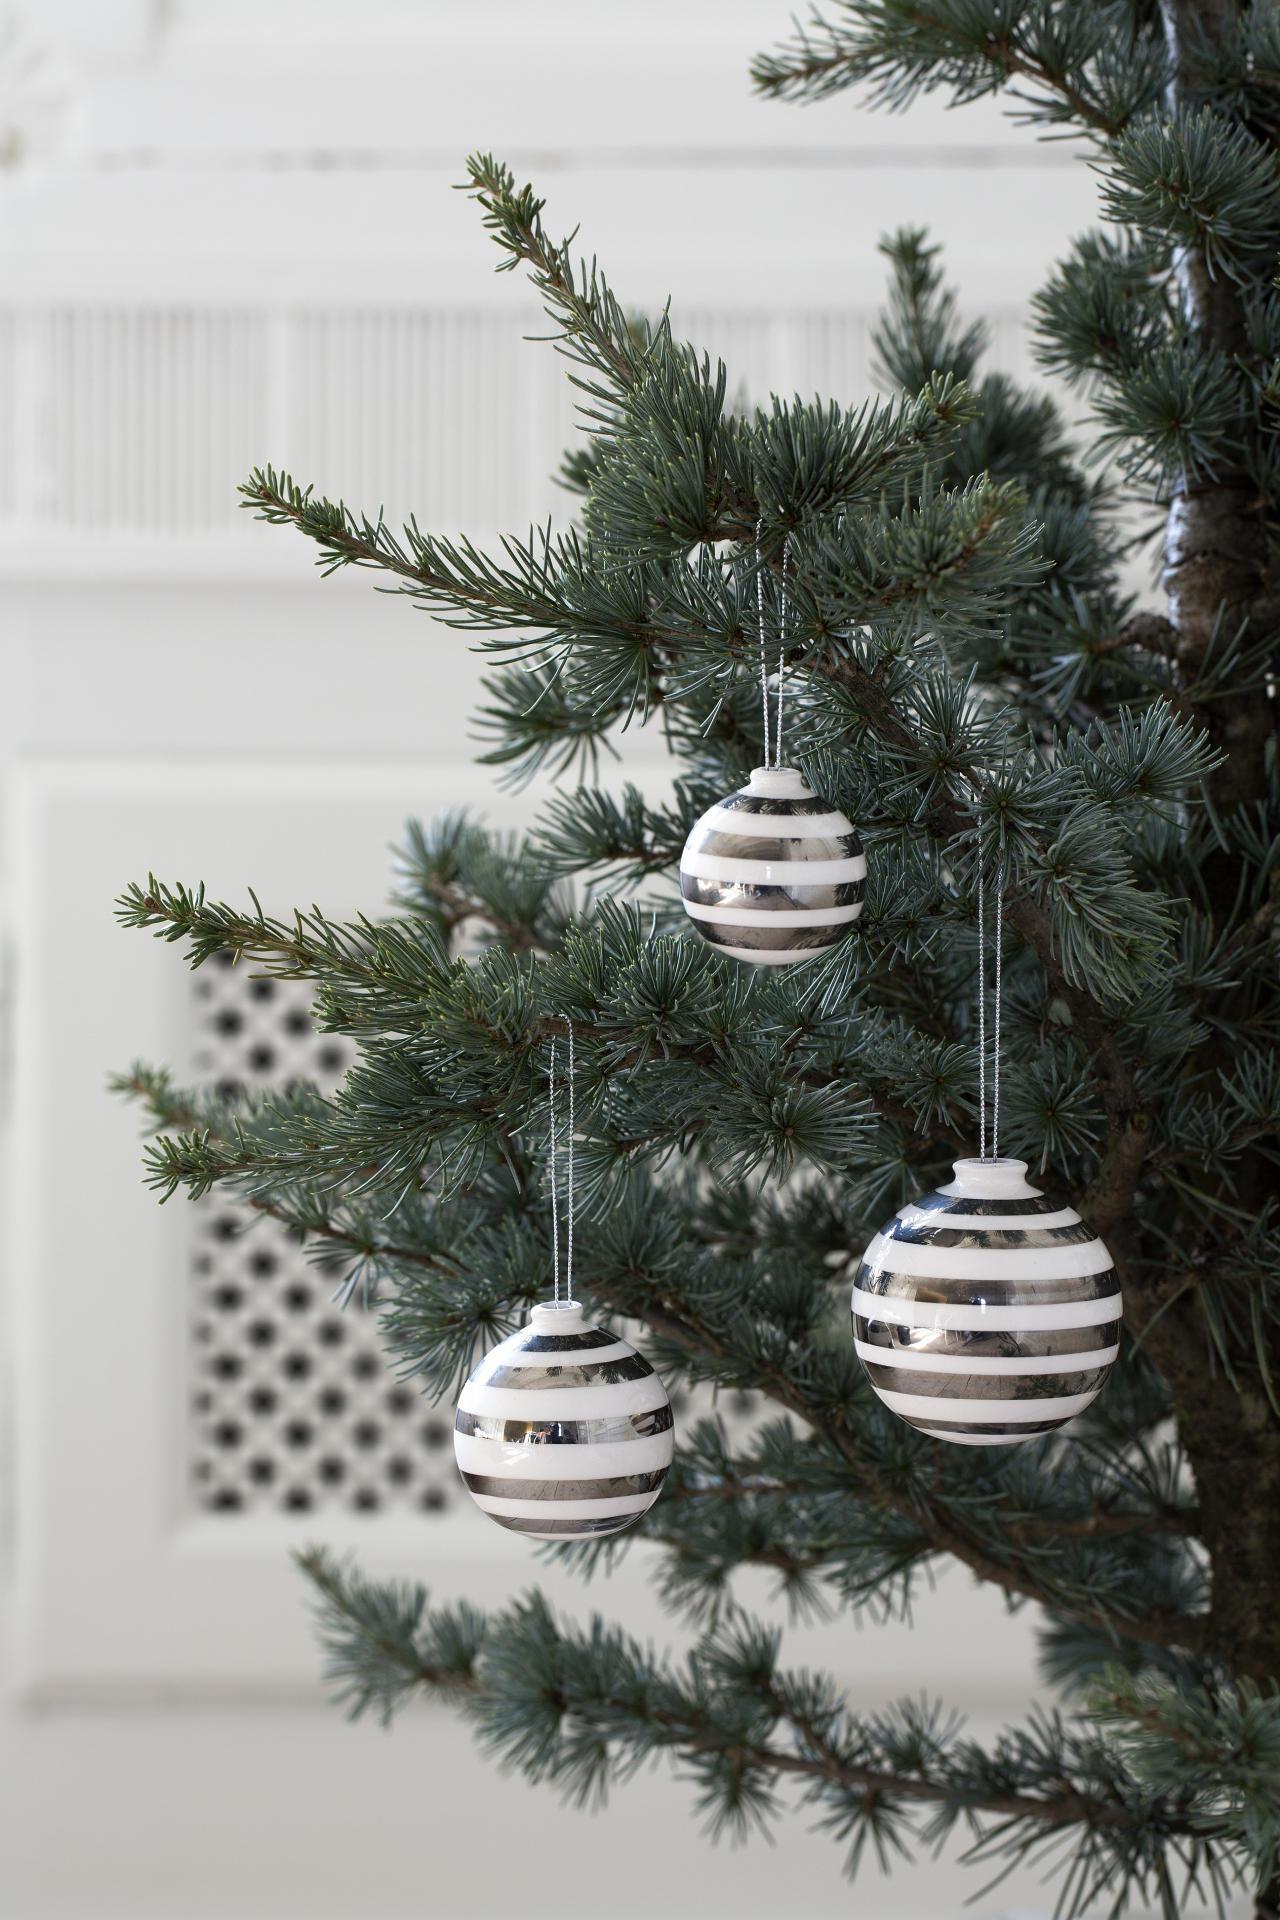 Kähler Keramické vánoční ozdoby Omaggio Silver - set 3 ks